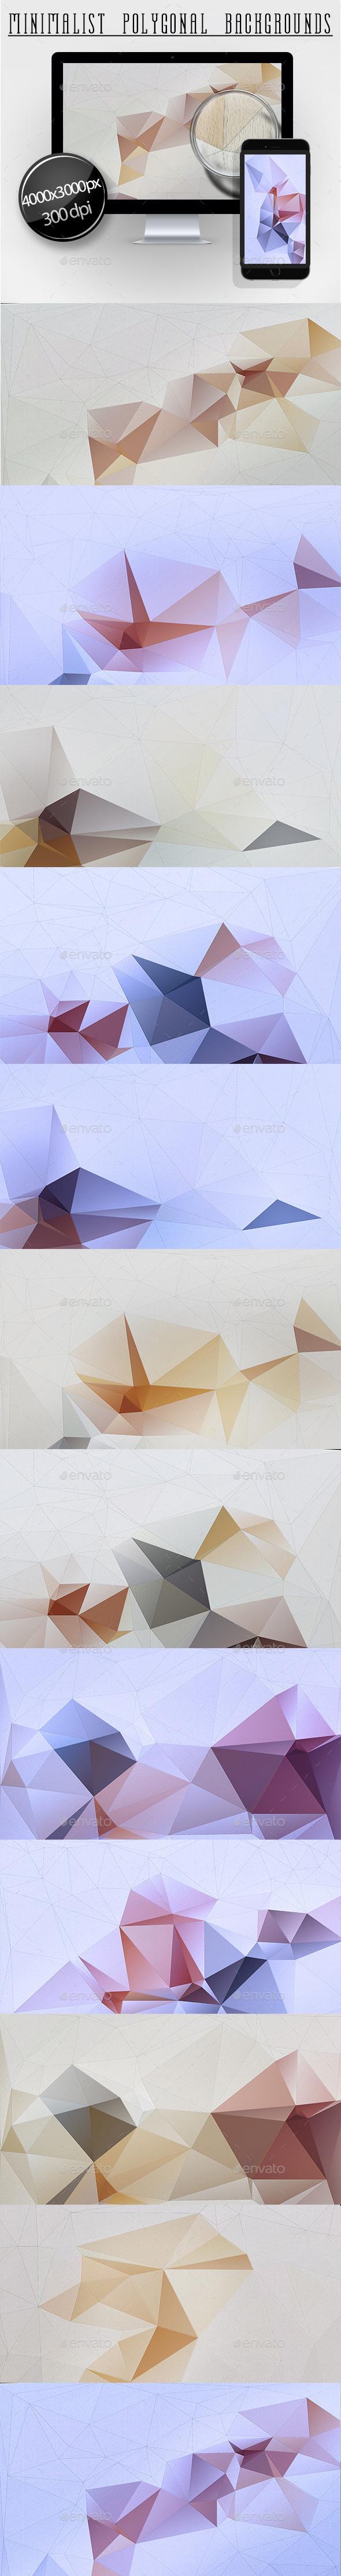 Minimalist Polygonal Backgrounds